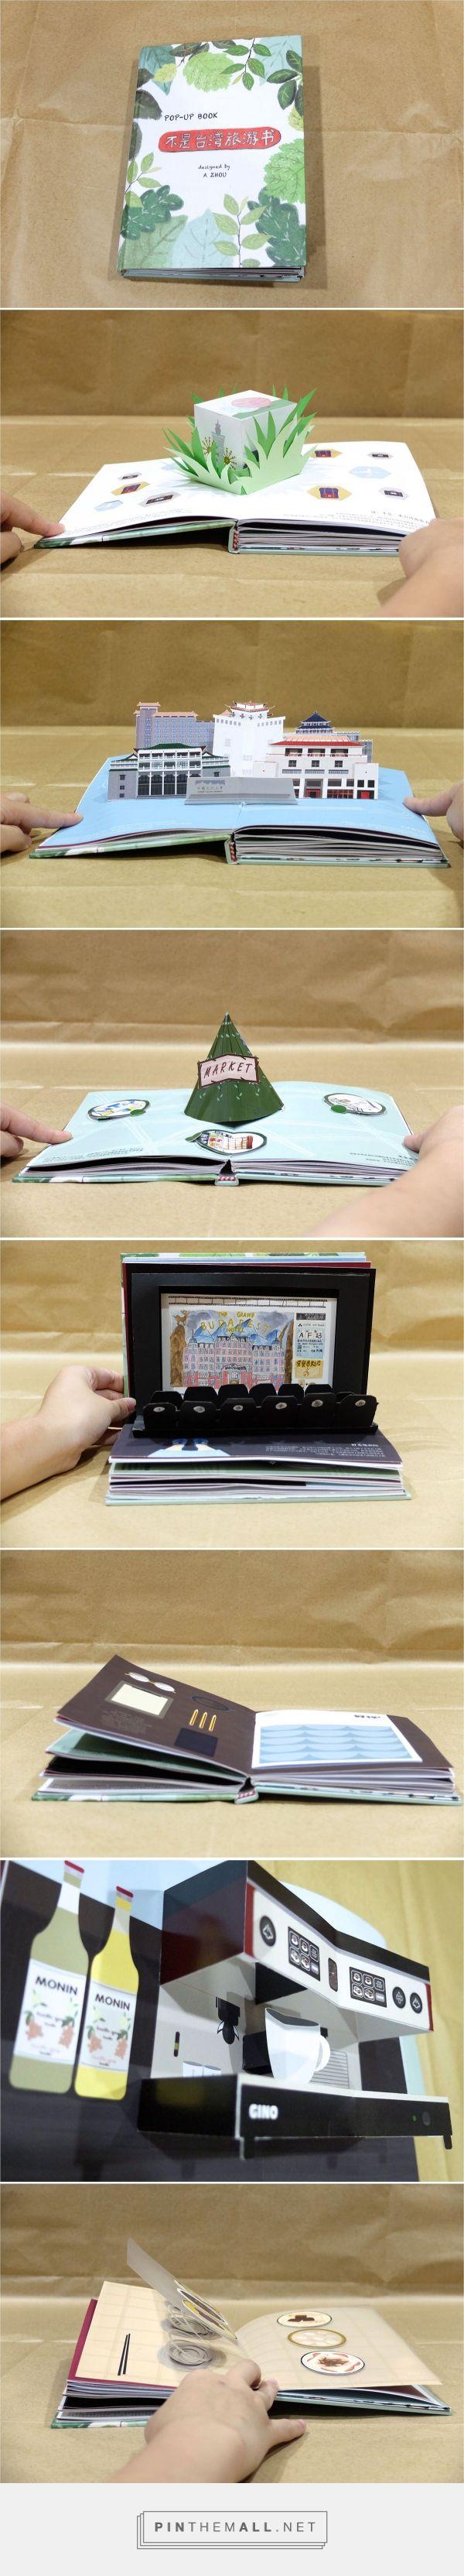 POP-UP BOOK《不是台湾旅游书》